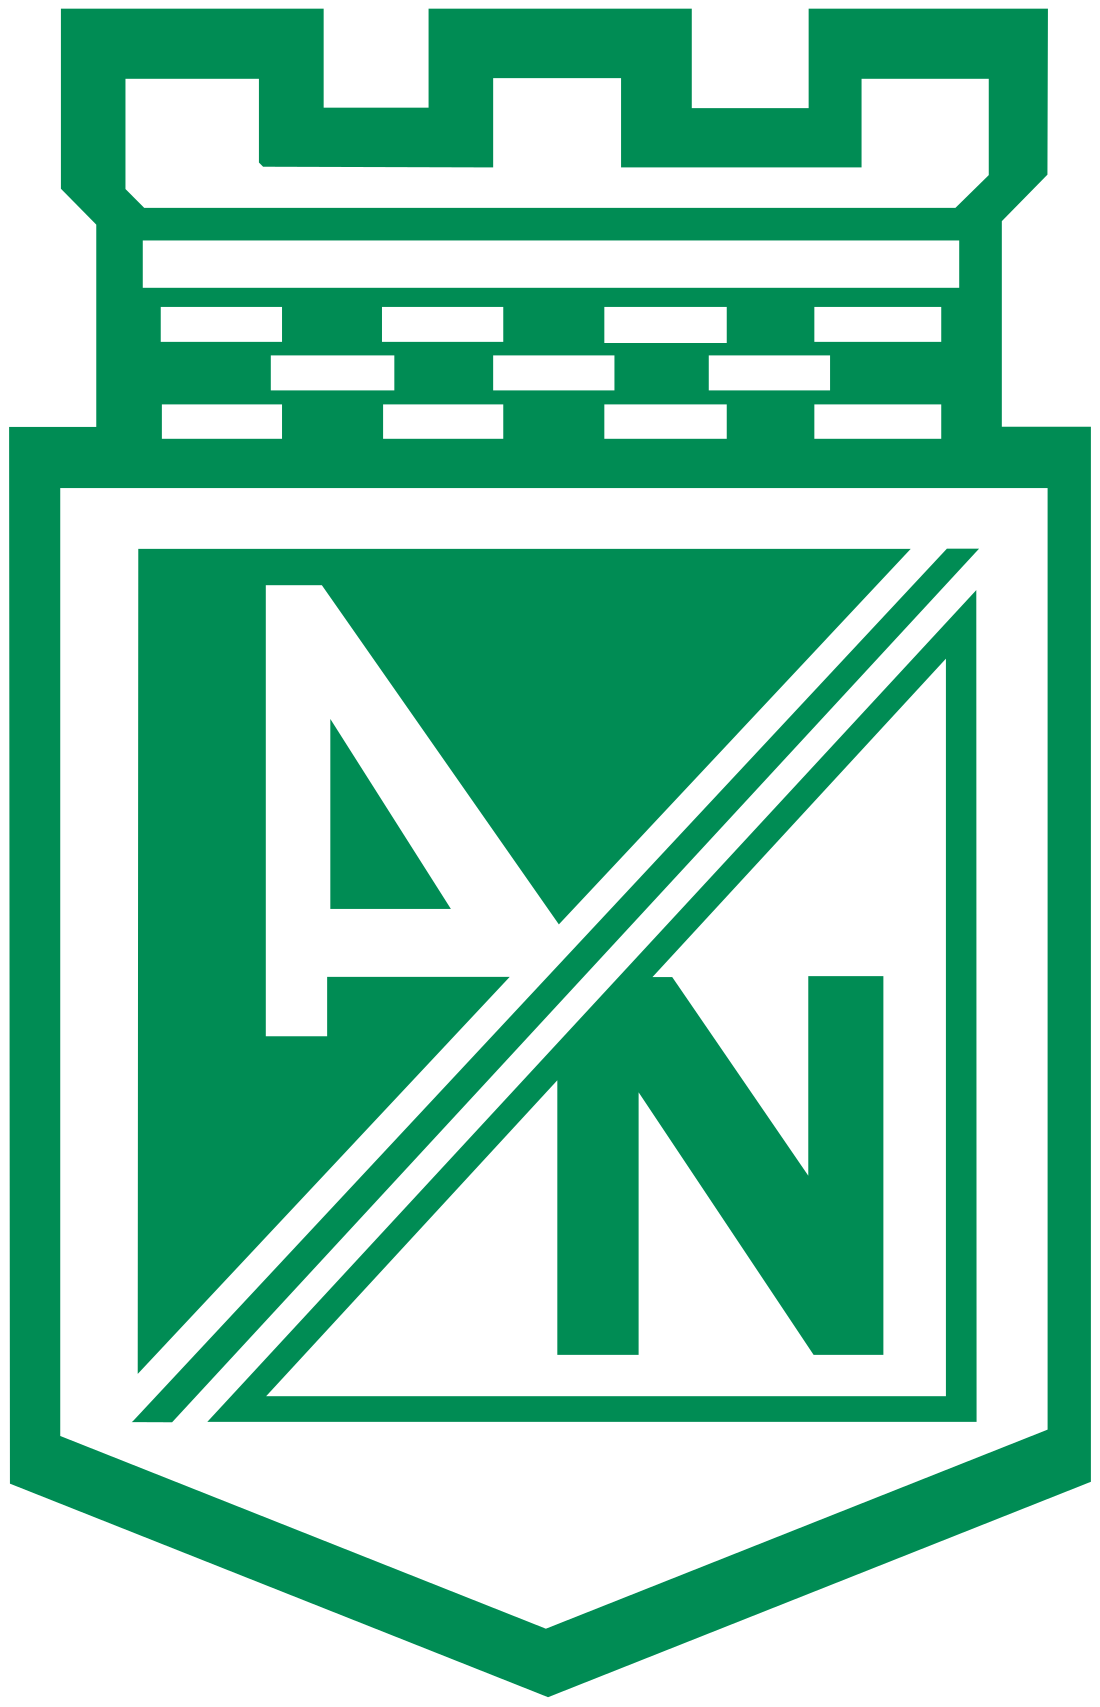 atletico nacional logo escudo 3 - Club Atlético Nacional Logo - Escudo